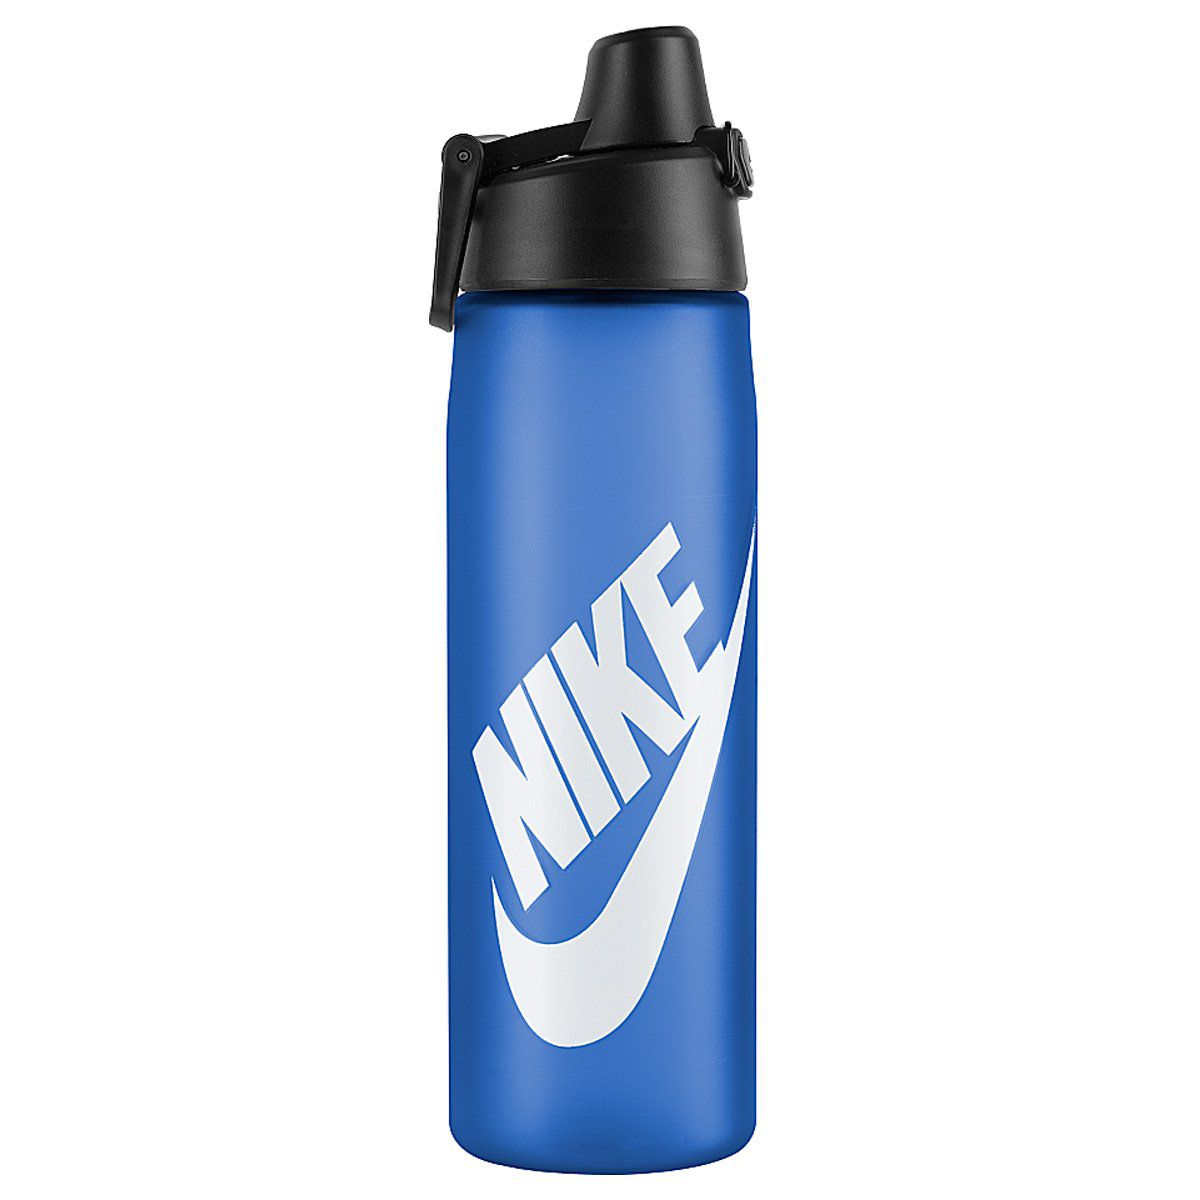 Squeeze Nike Hydro Flow Futura Water Bottle 709 ml